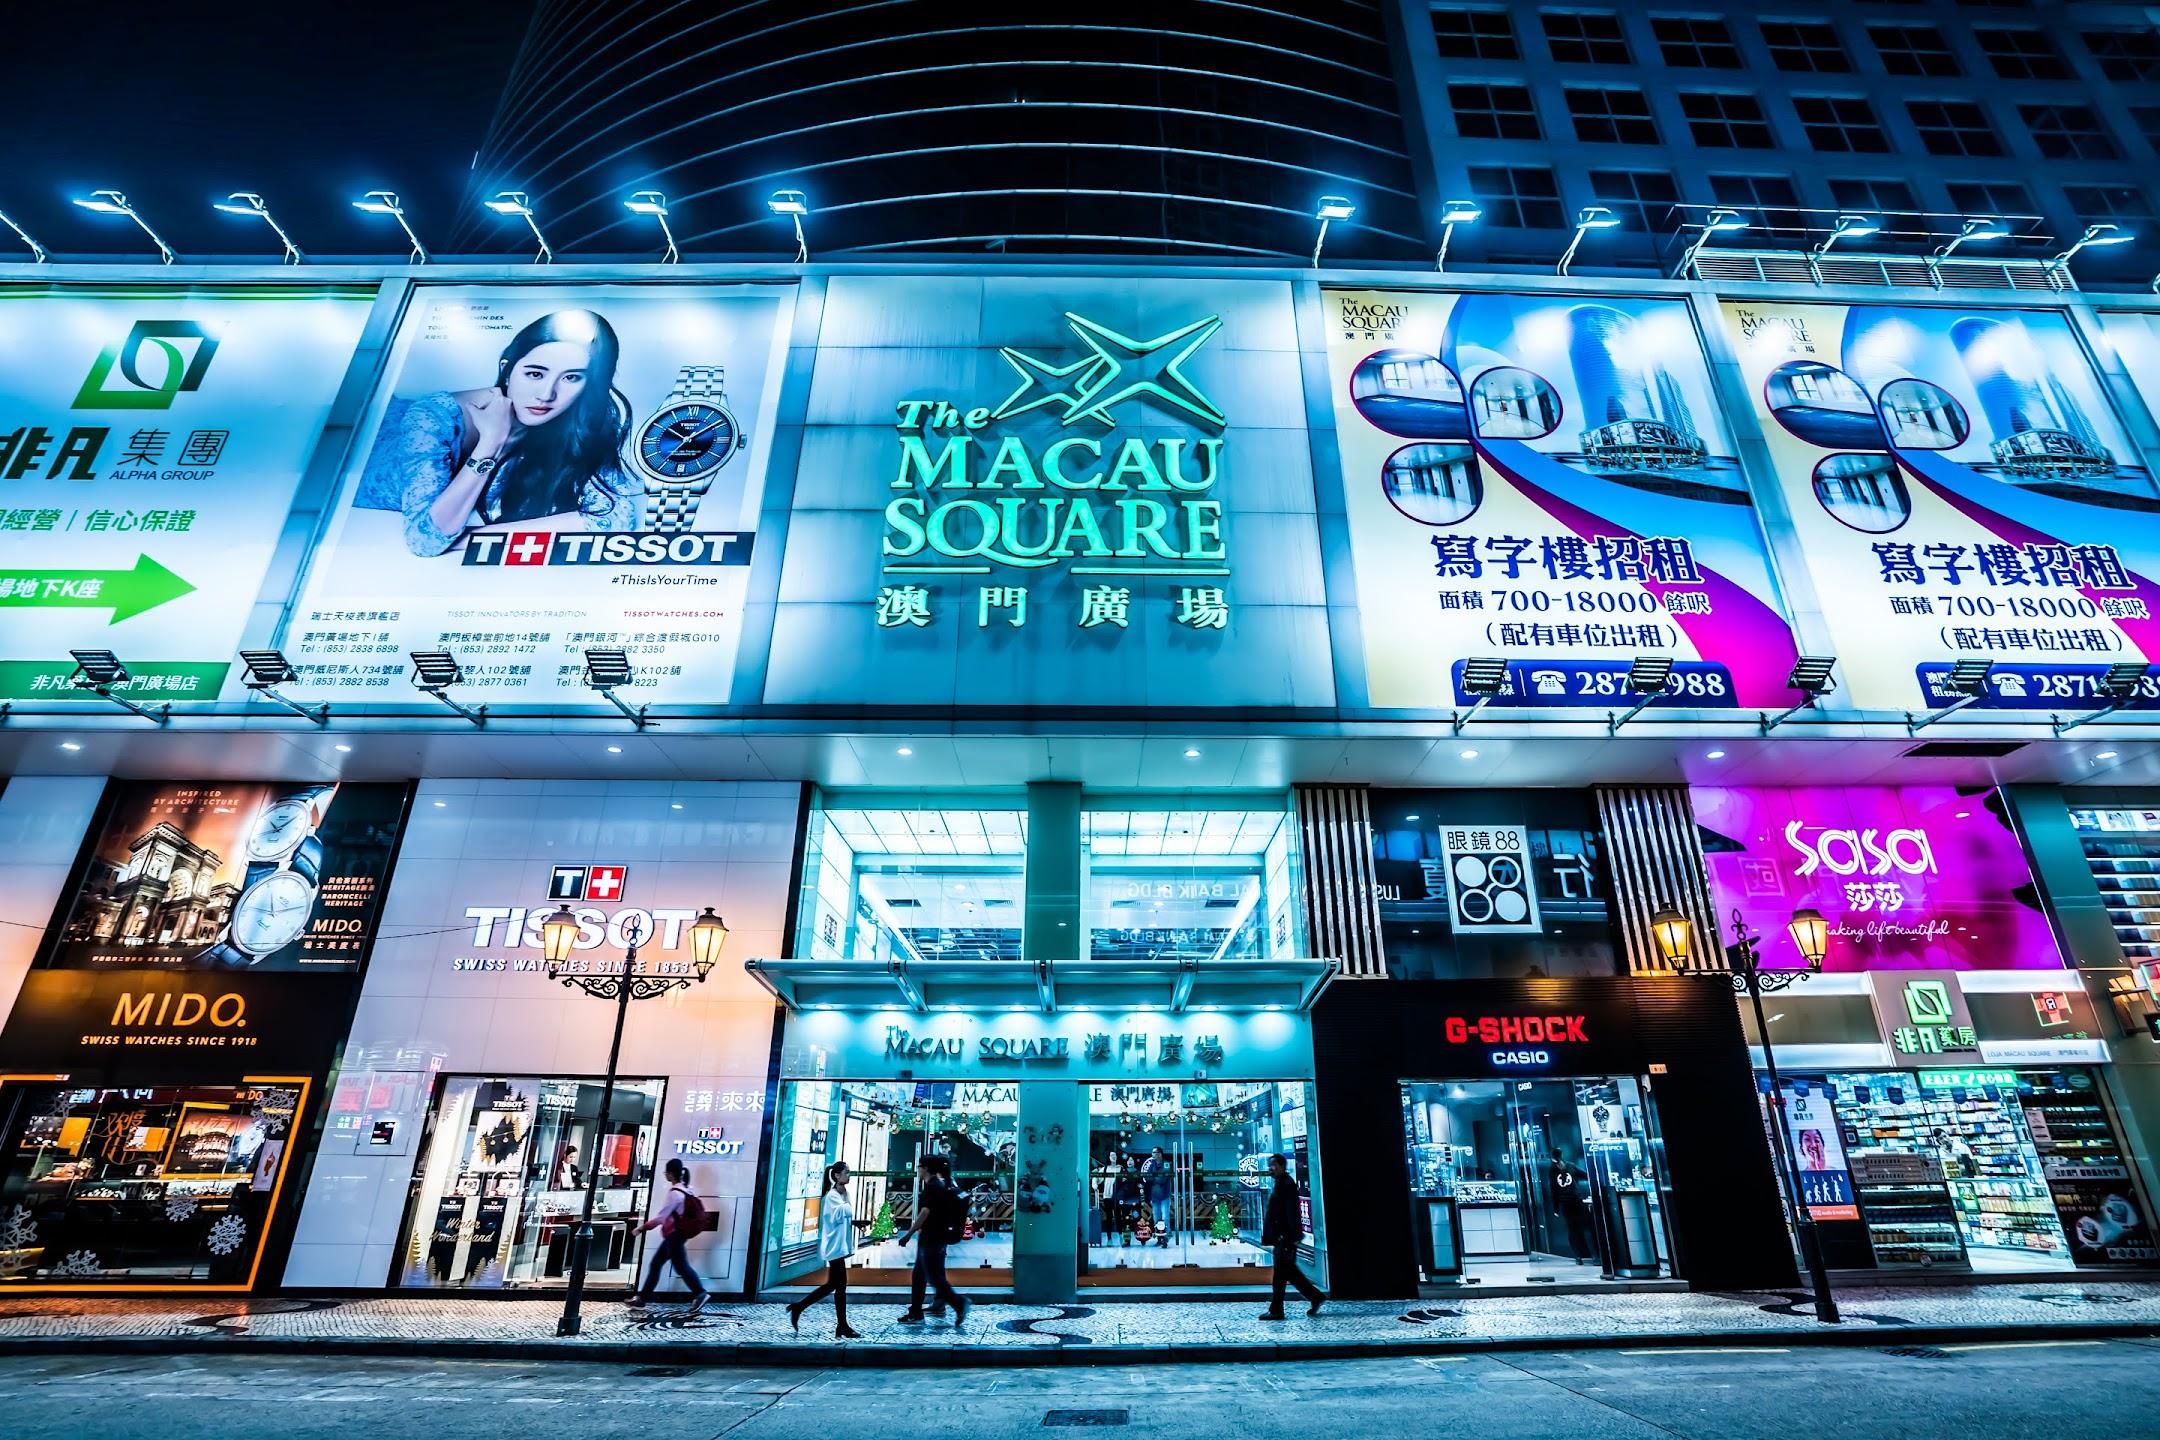 Macau Square(澳門廣場)